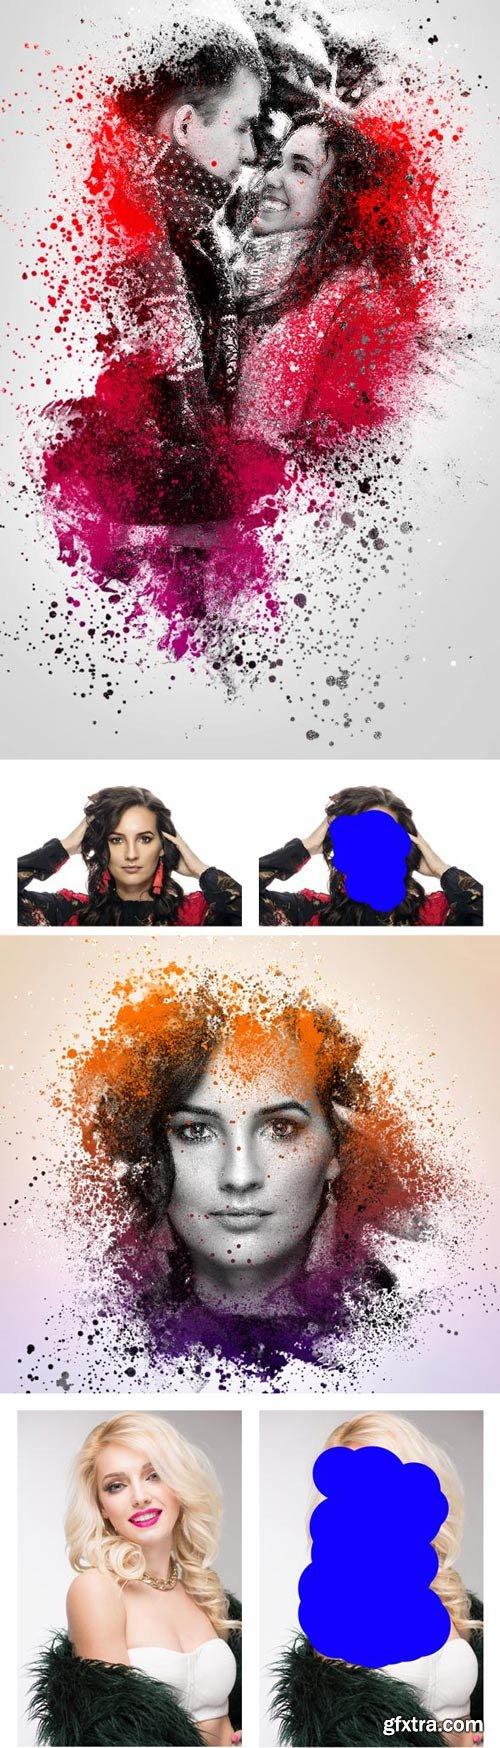 GraphicRiver - Colored Splash Photoshop Action - 22794175